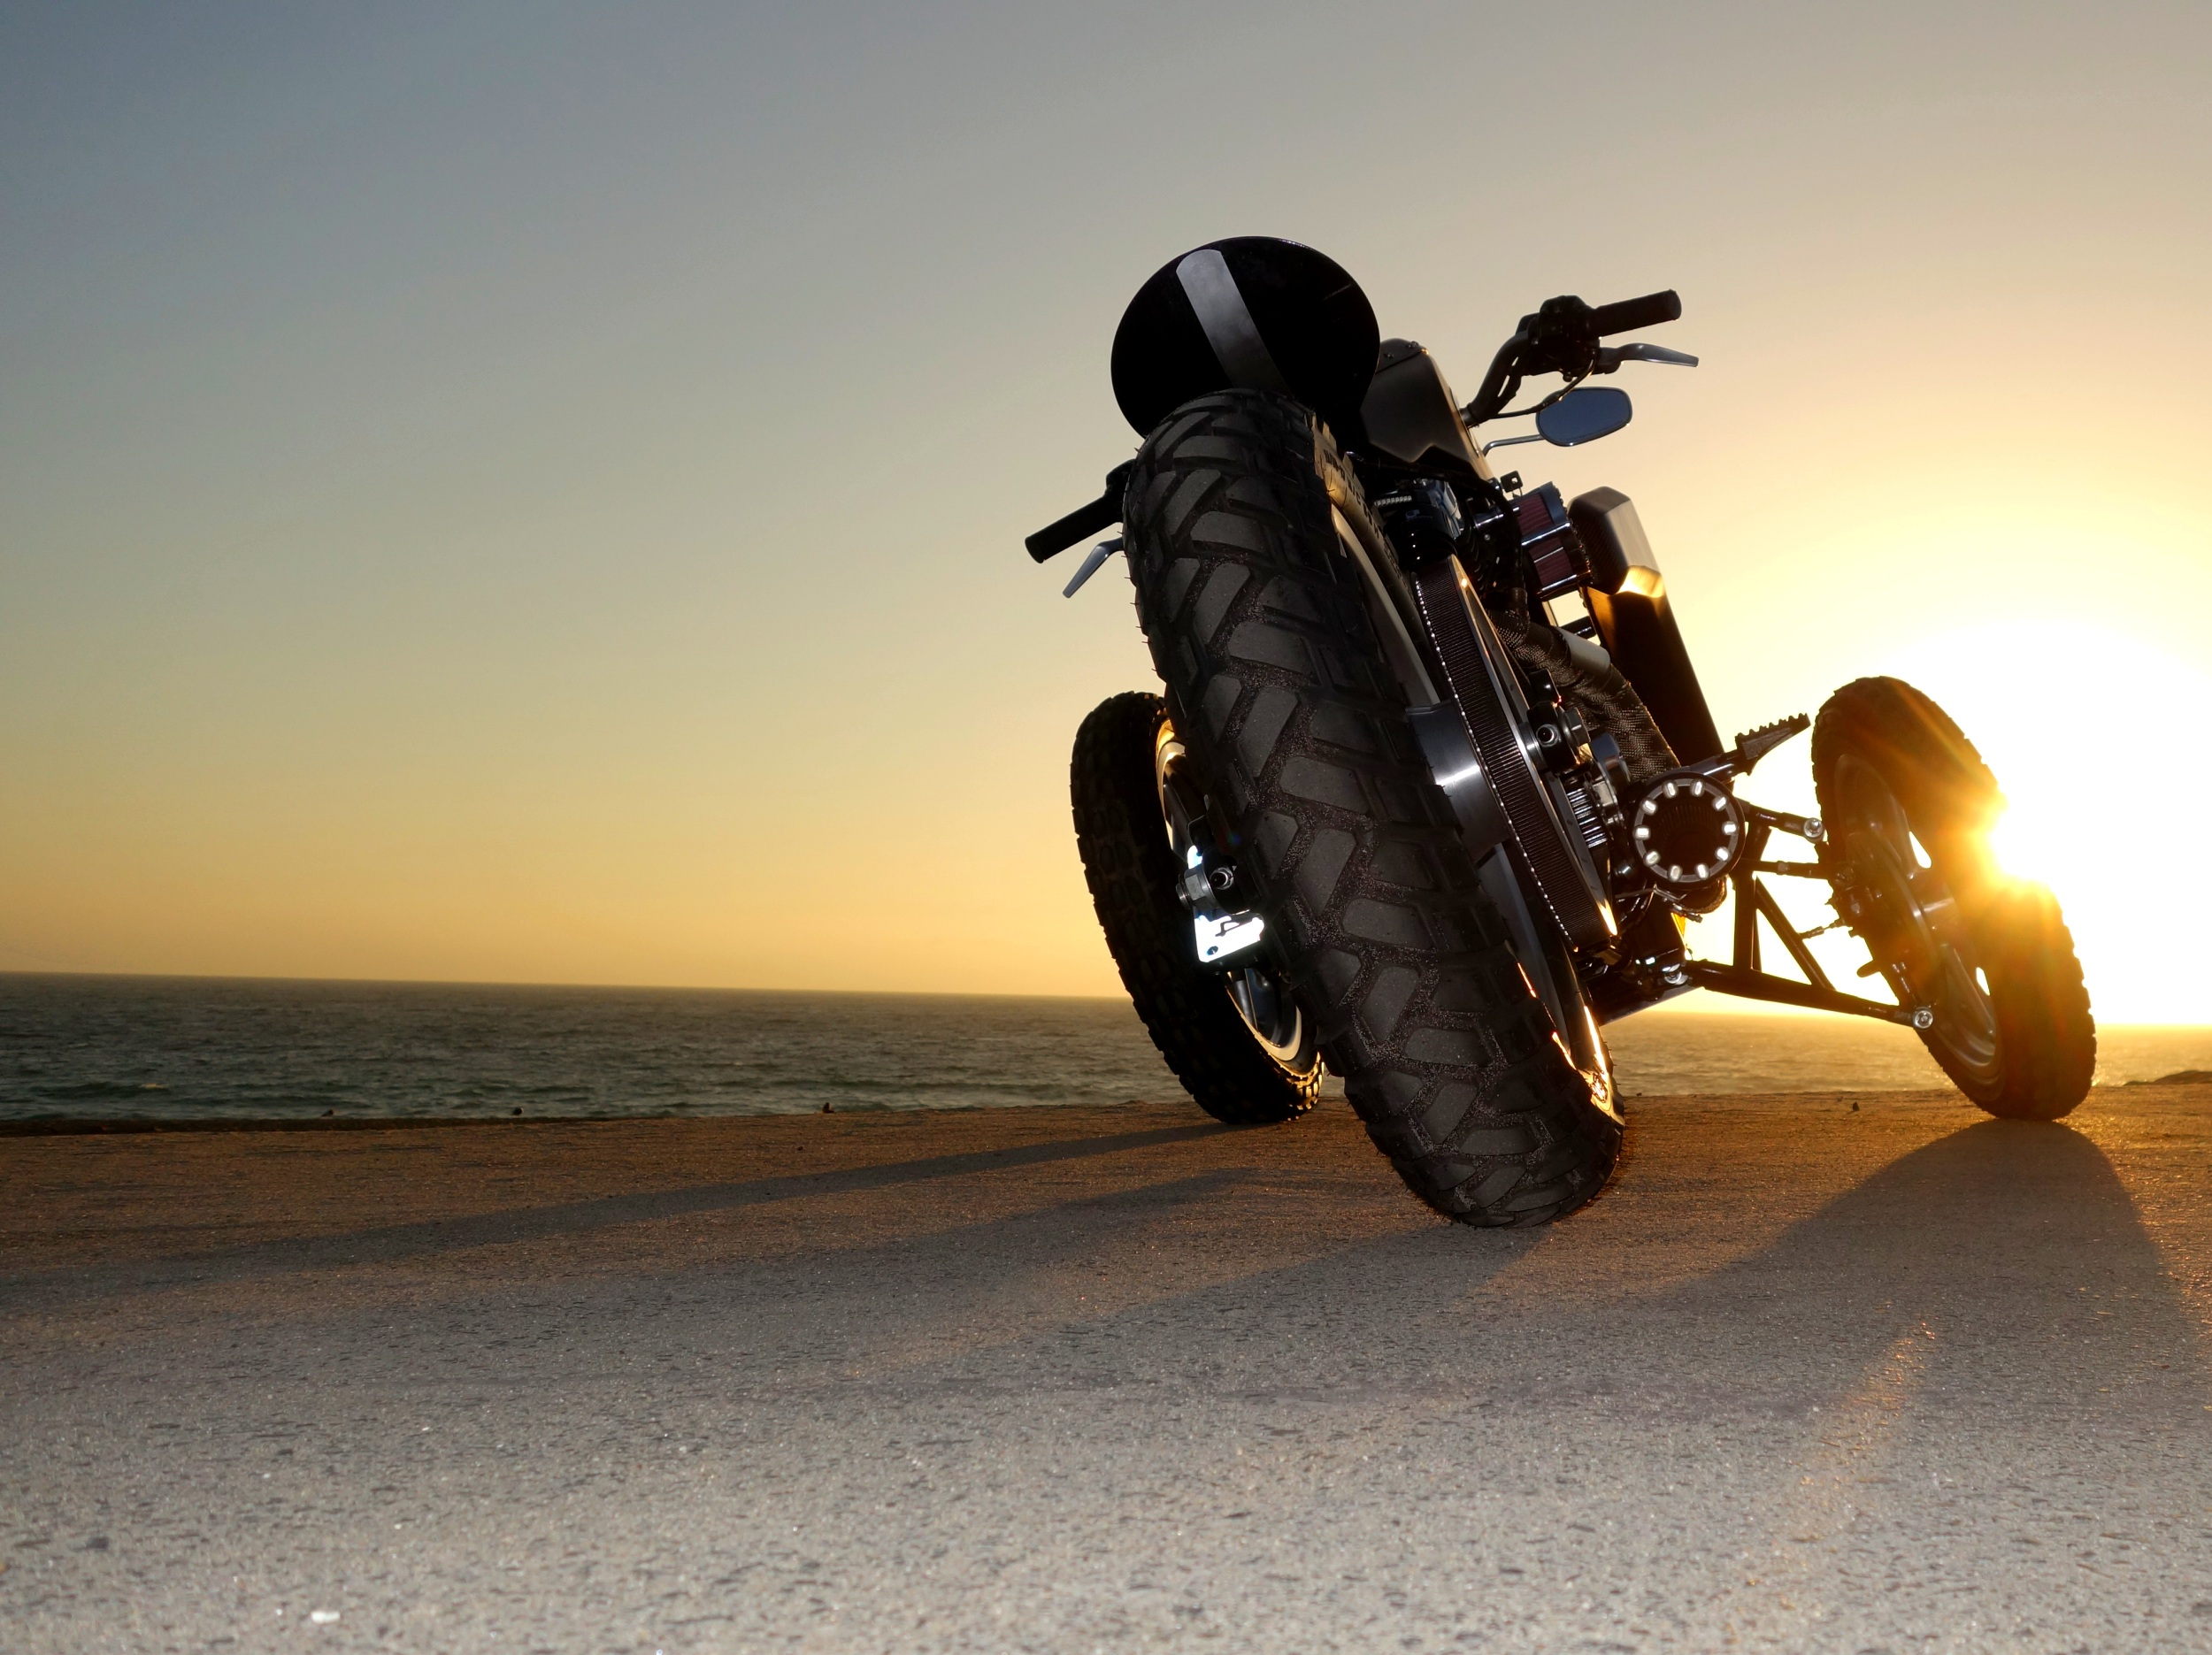 Garmr - Sunset - Sunset Beach - 2500px - V1.jpg